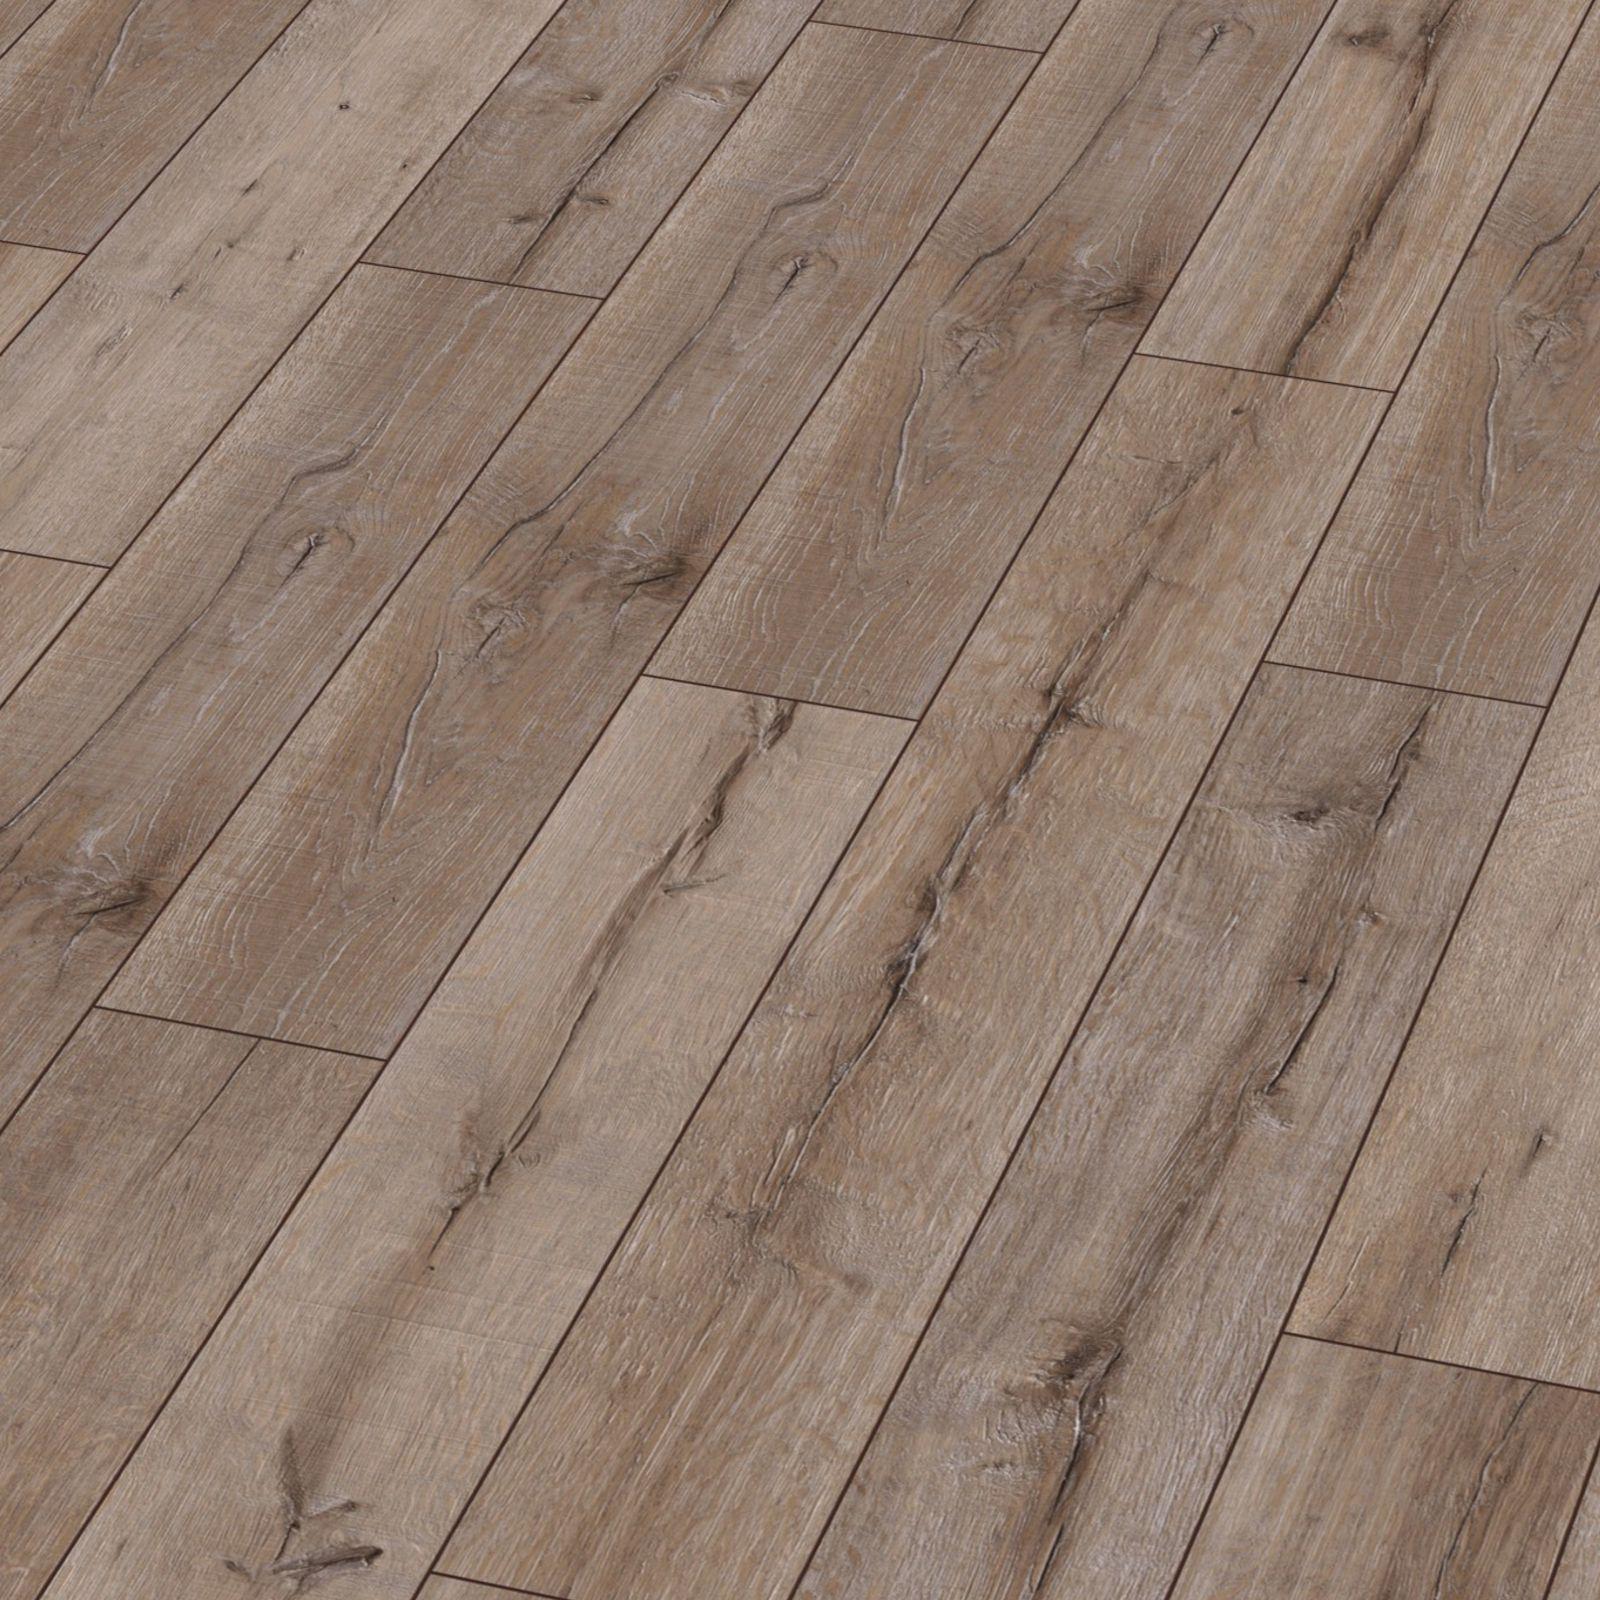 Karras - Krono Swiss - Πάτωμα Laminate Kronotex Robusto φουντουκιού με λευκά νερά απόχρωση Rip Oak